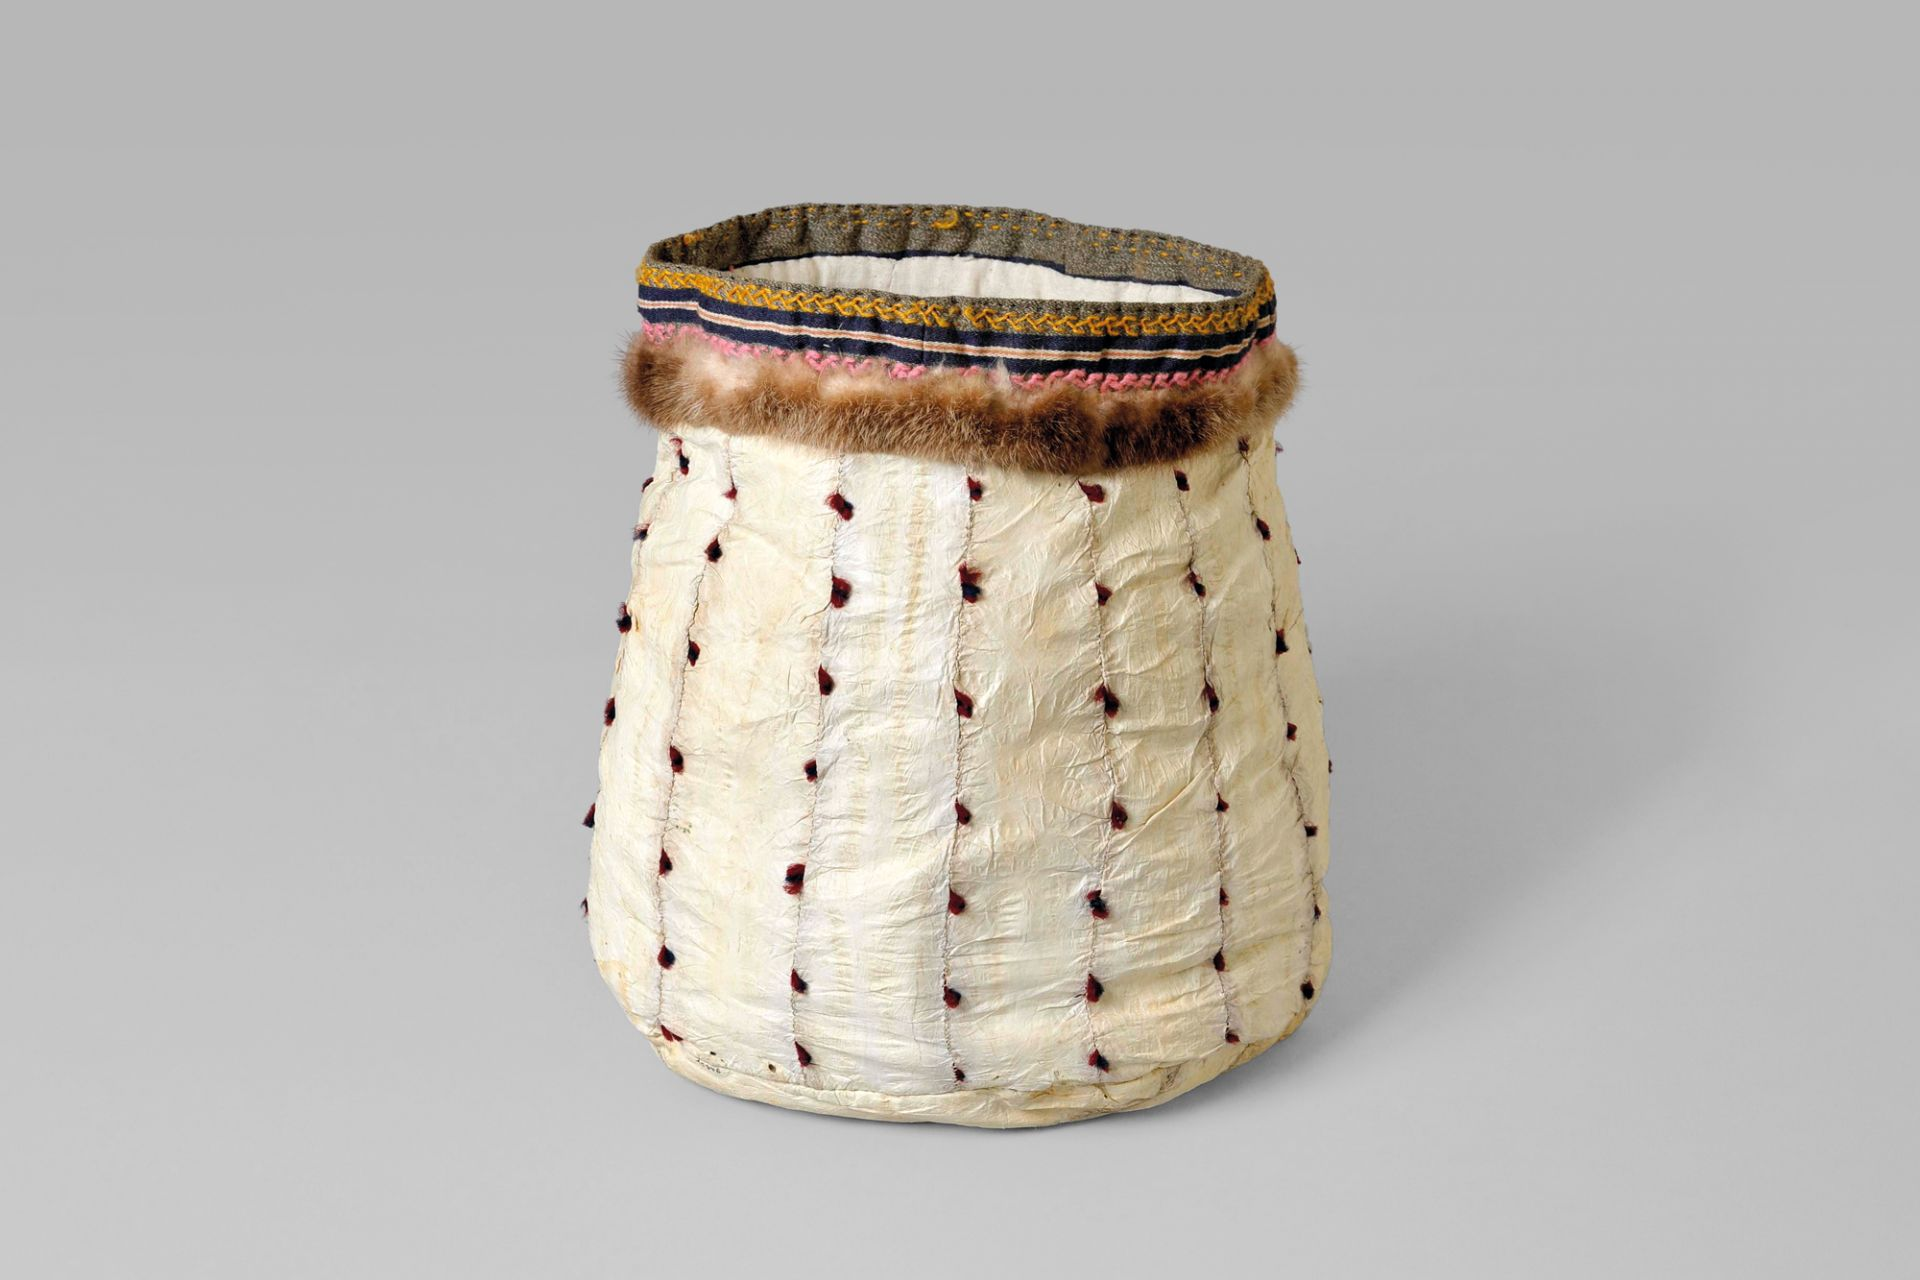 Pouch made of seal intestine, Alaska, USA, approx. 1890